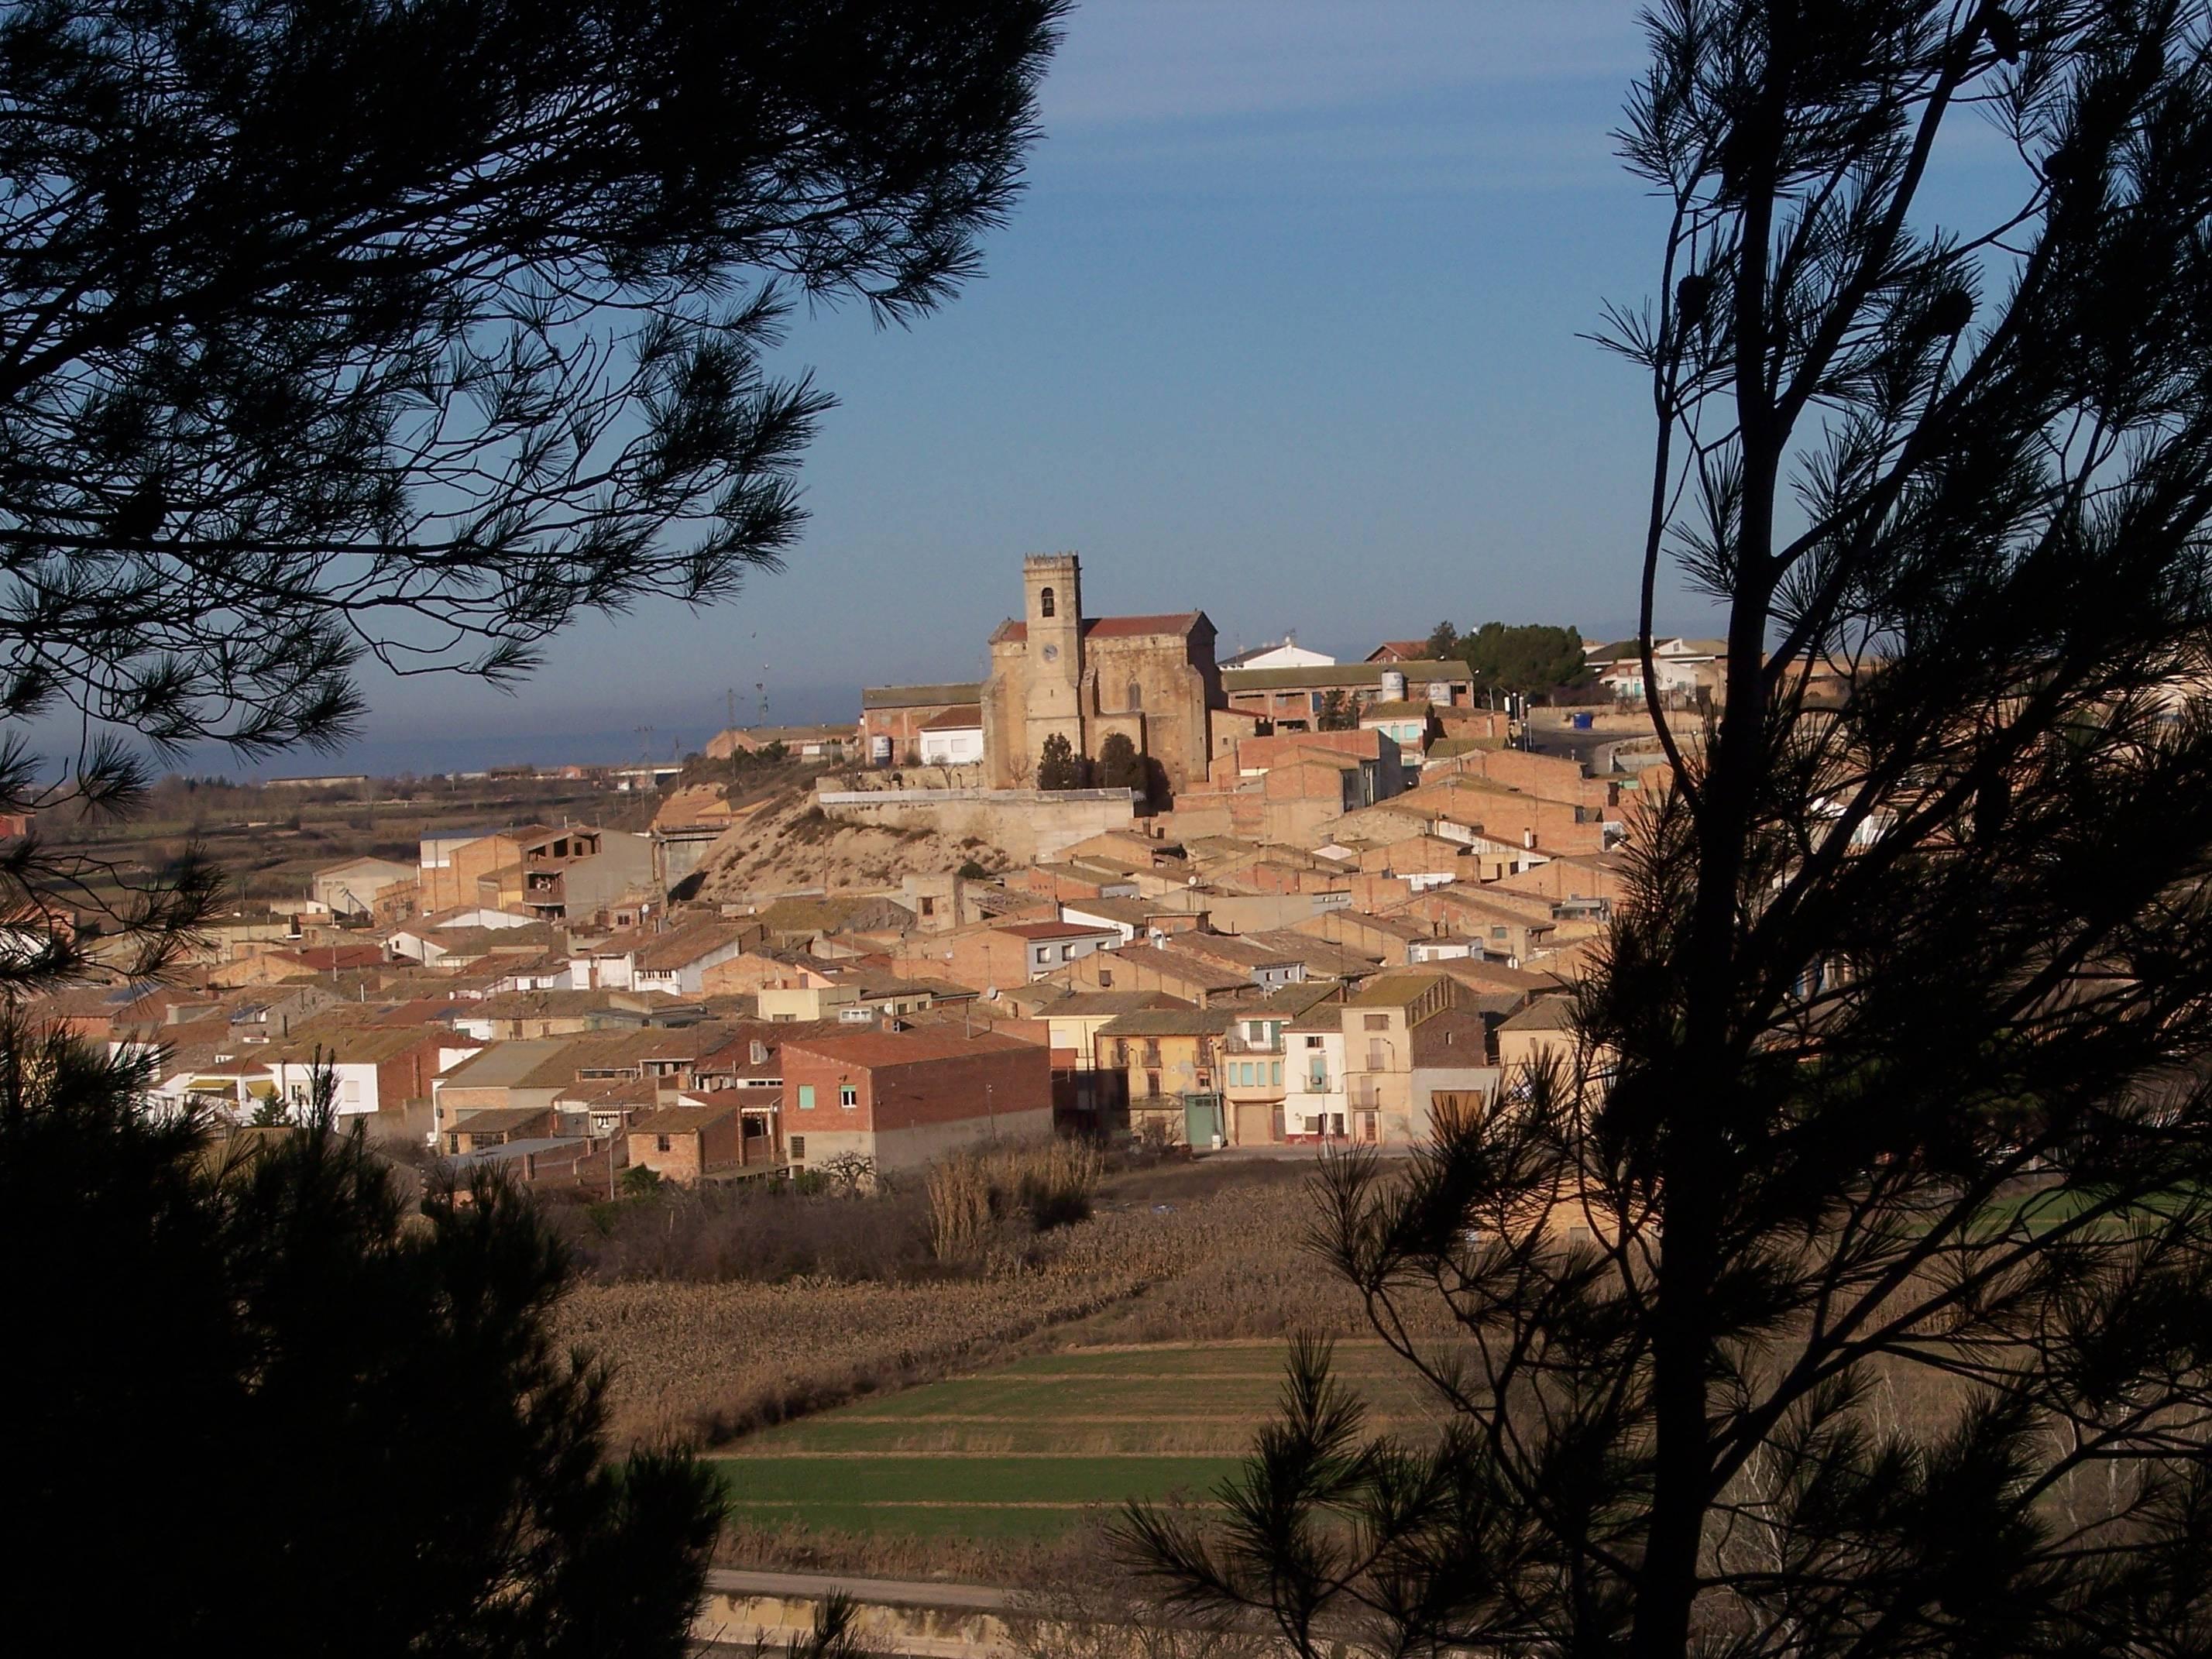 Generalitat de catalunya - generalitat de catalunya